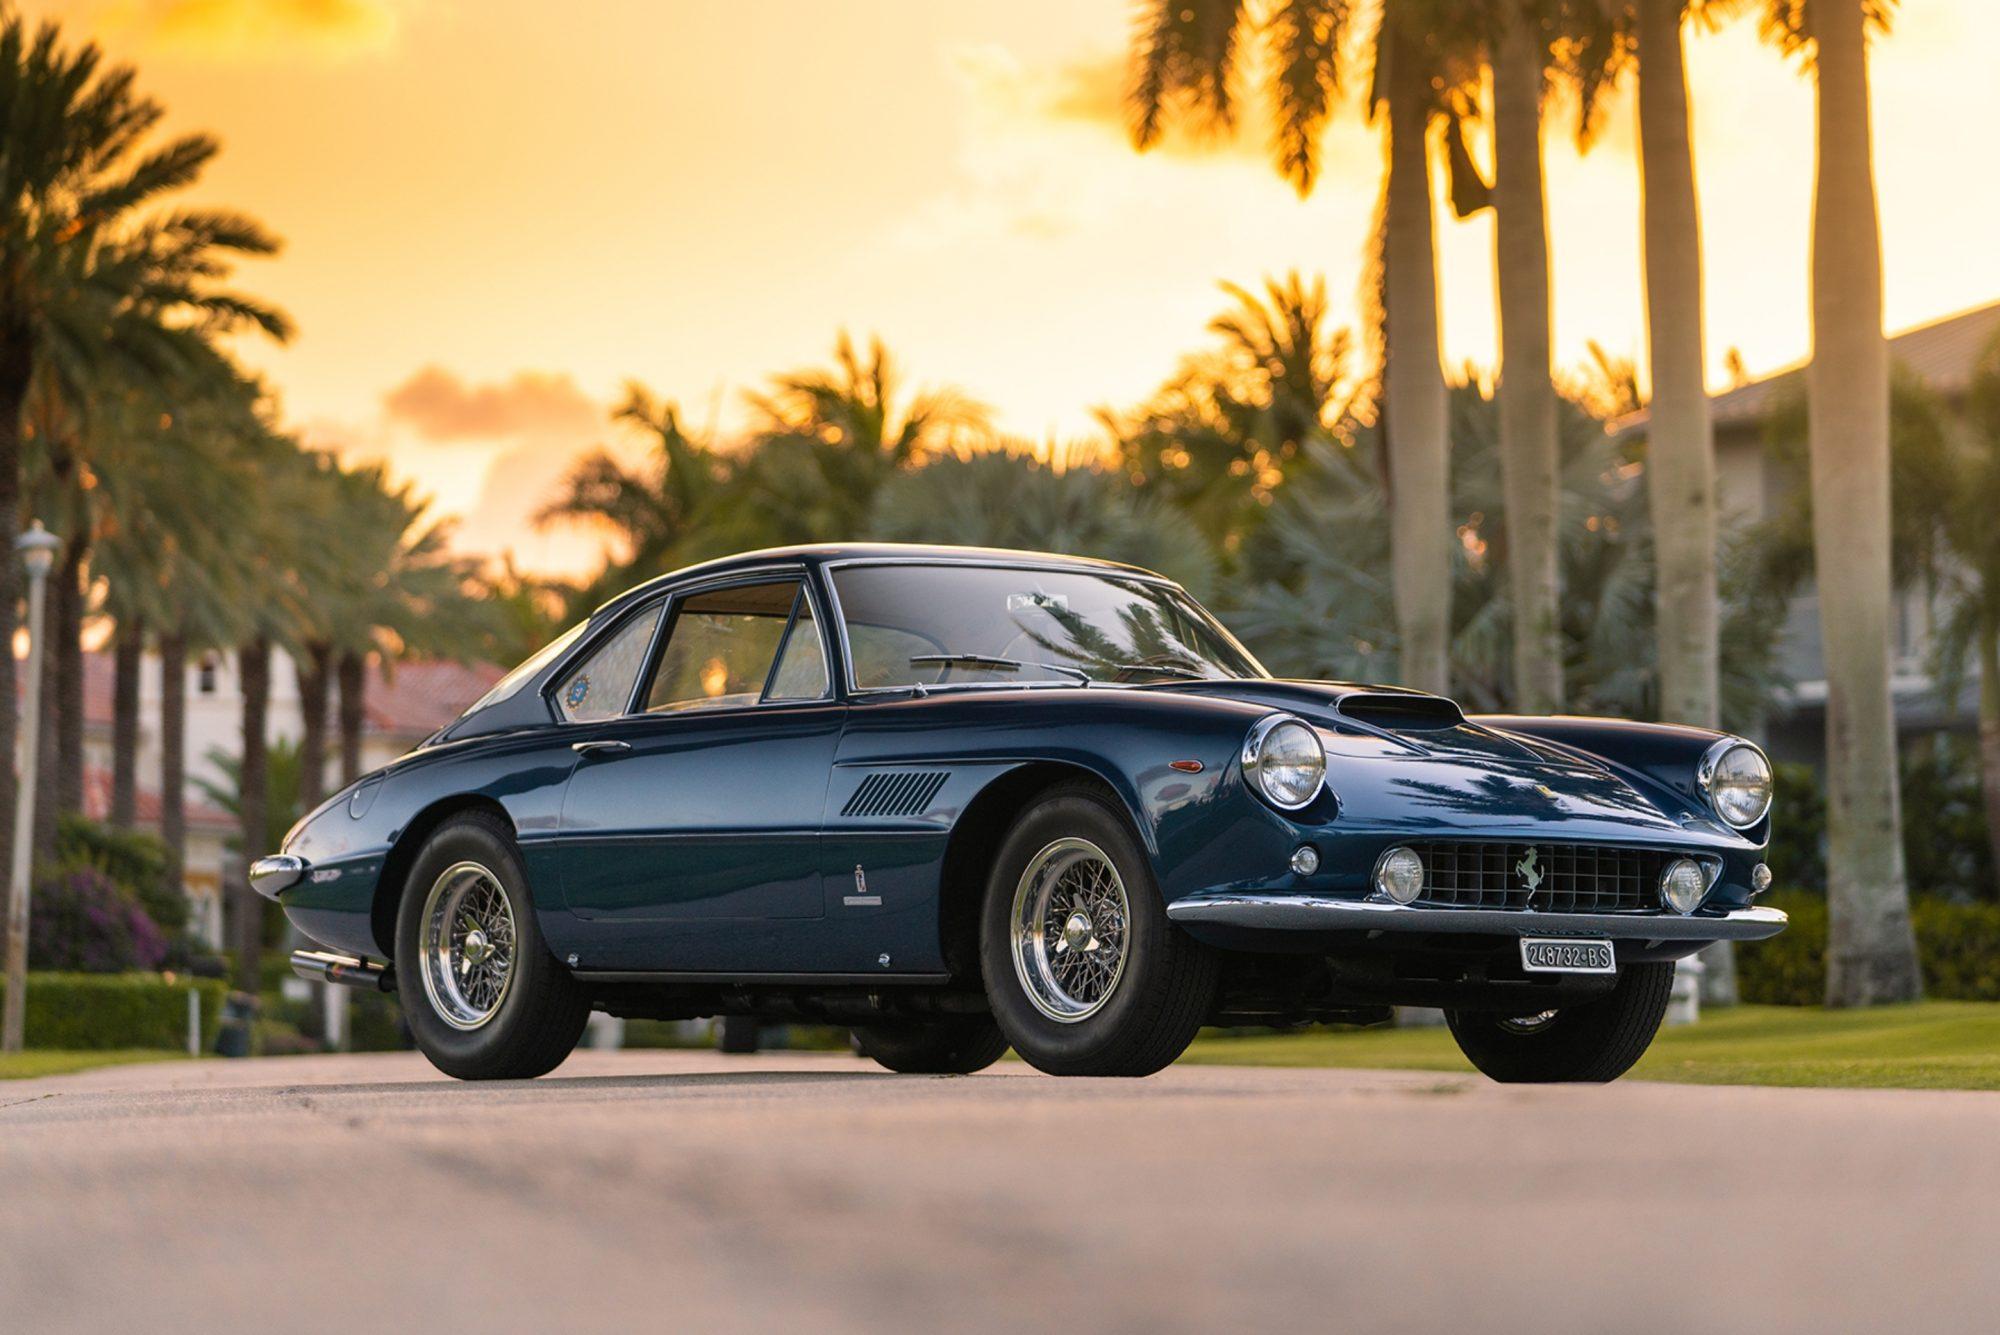 1962_Ferrari_400_Superamerica_Series_I_Coupe_Aerodinamico_03-2000x1335